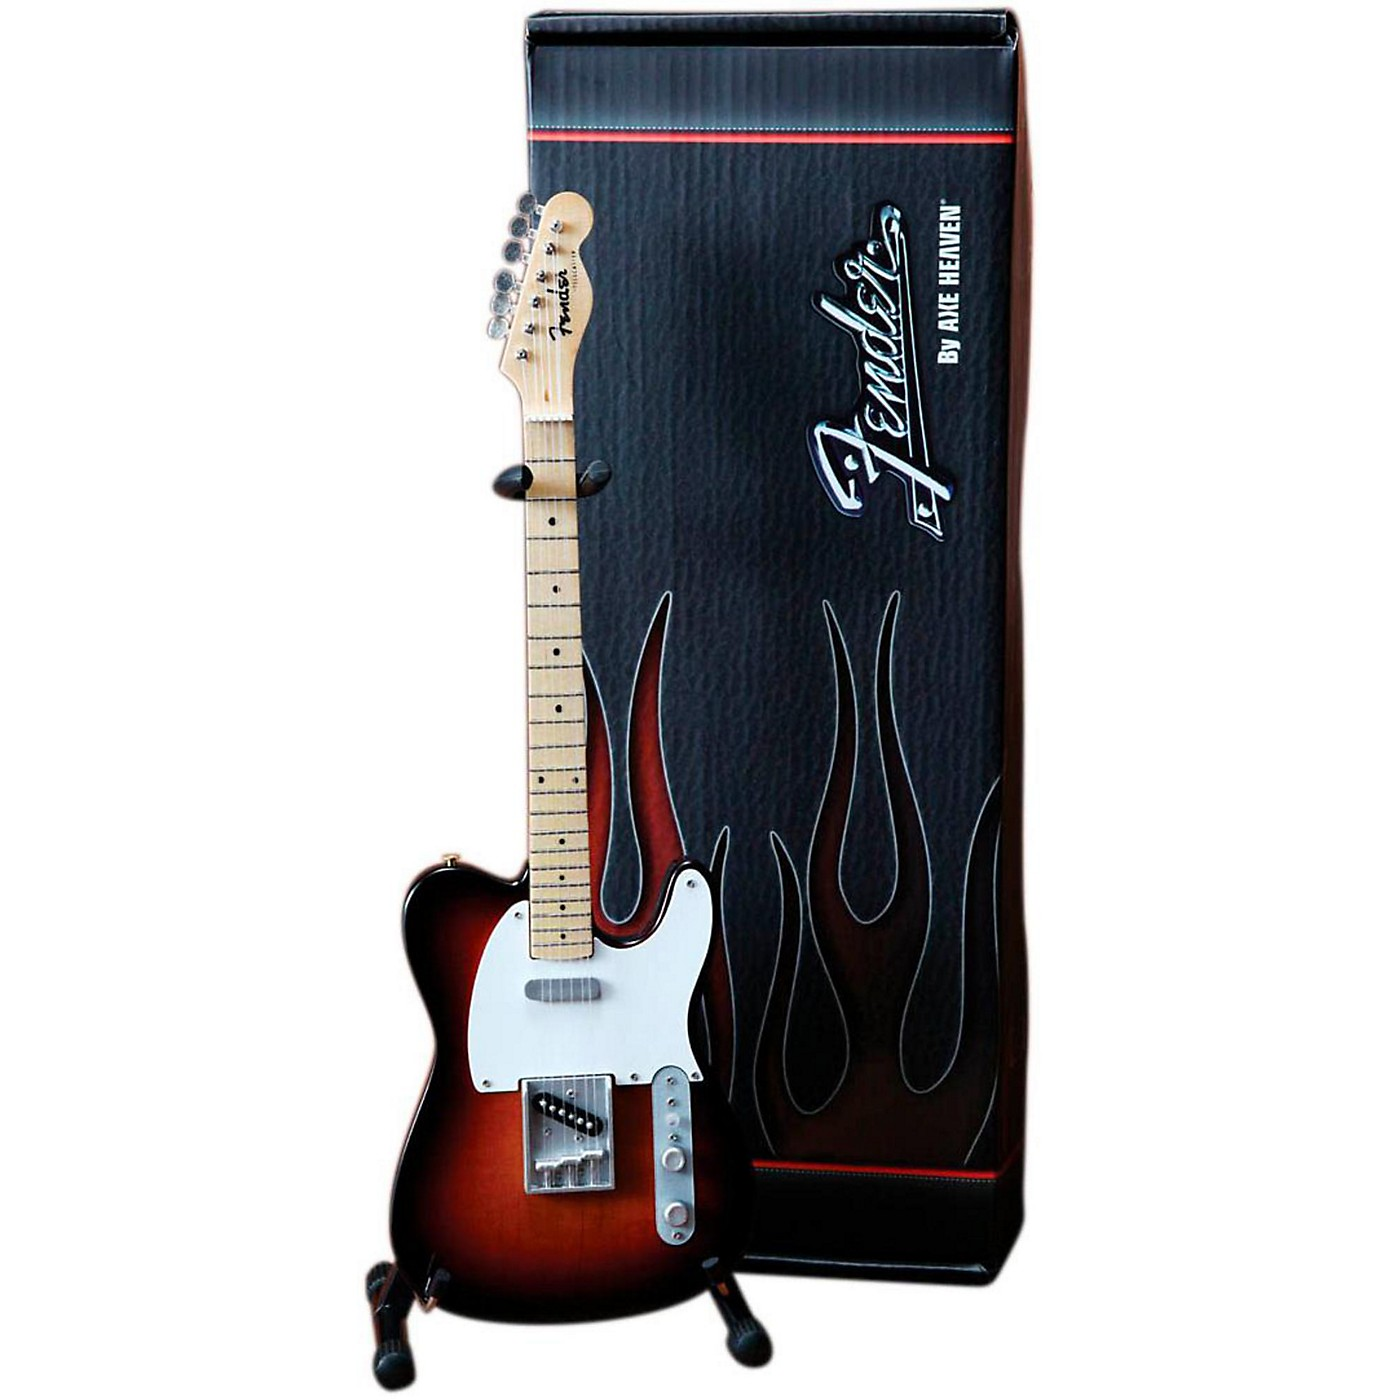 Axe Heaven Fender Telecaster Classic Sunburst Miniature Guitar Replica Collectible thumbnail